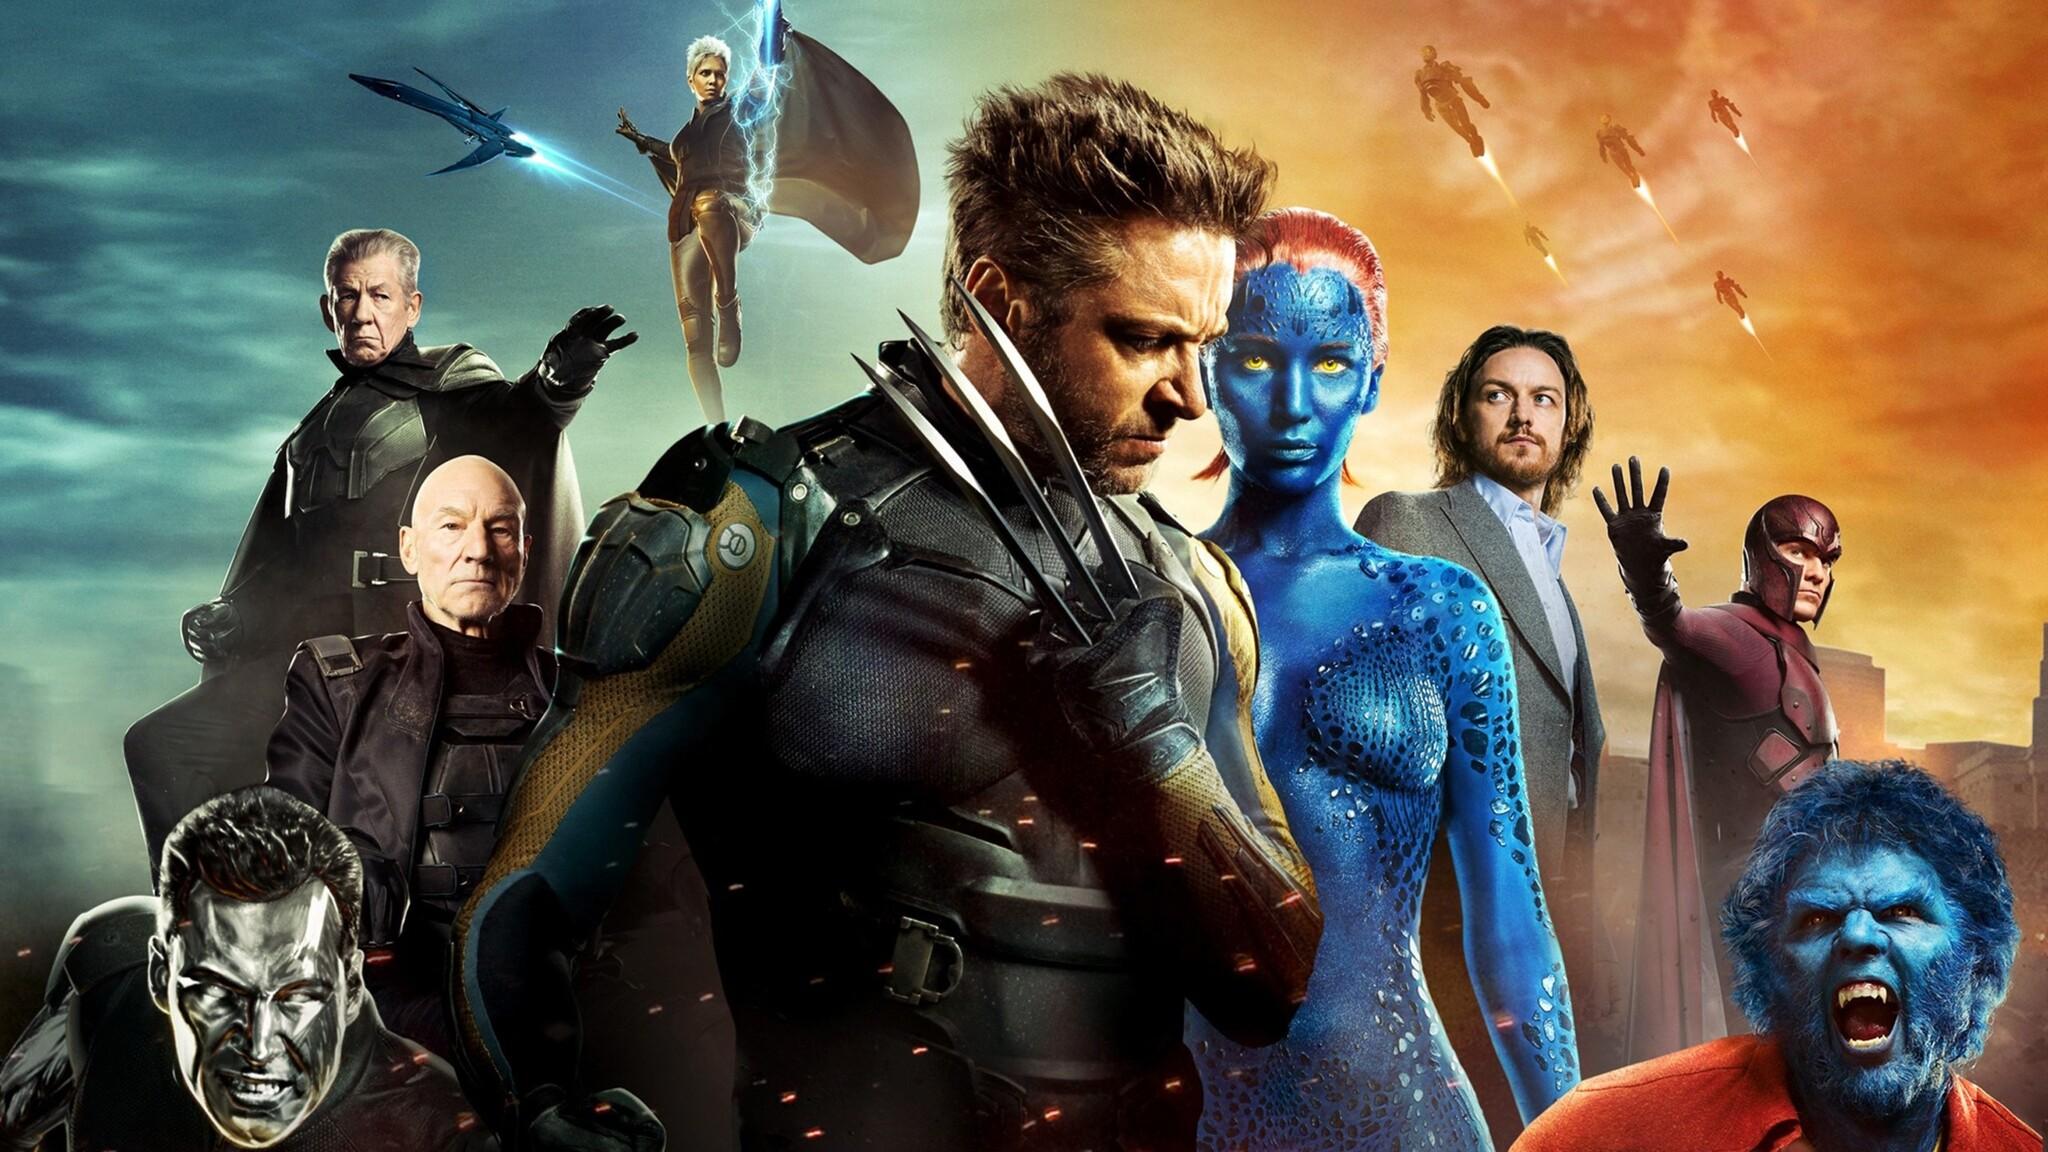 2048x1152 X Men Days Of Future Past Poster 2048x1152 ...